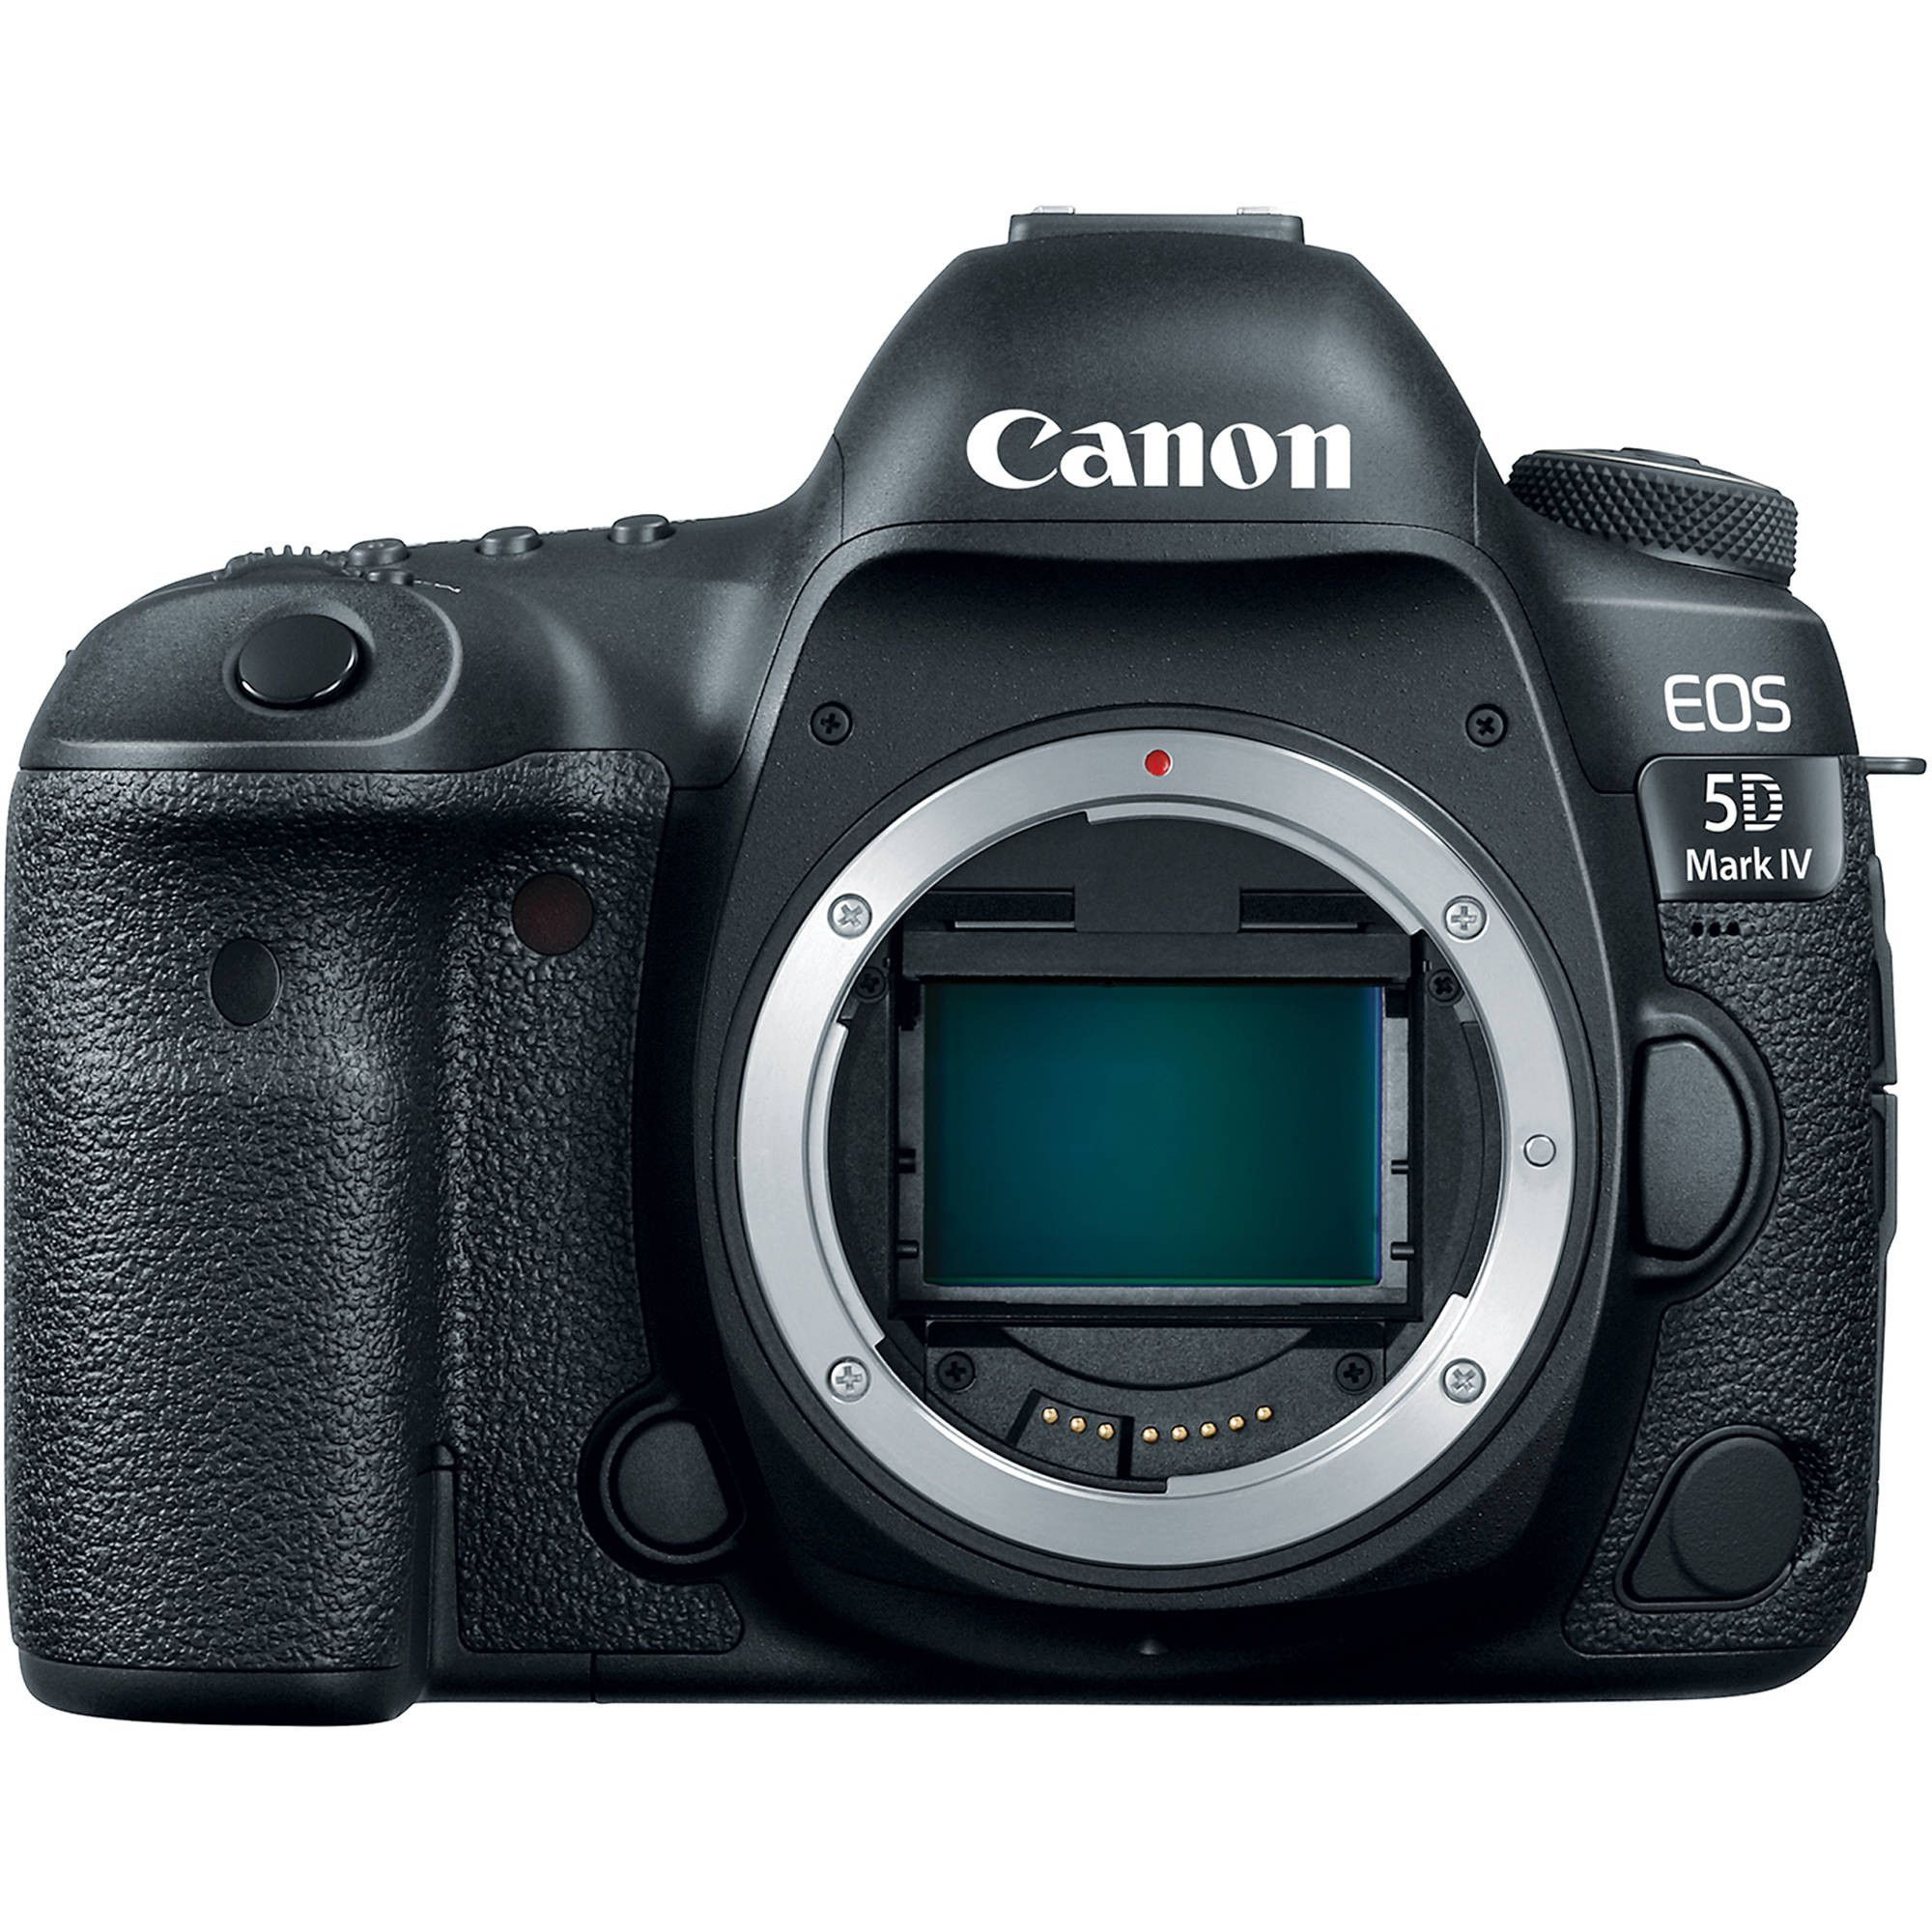 Canon Eos 5d Mark Iv Body Only Canon Camera Models Canon Eos Best Camera